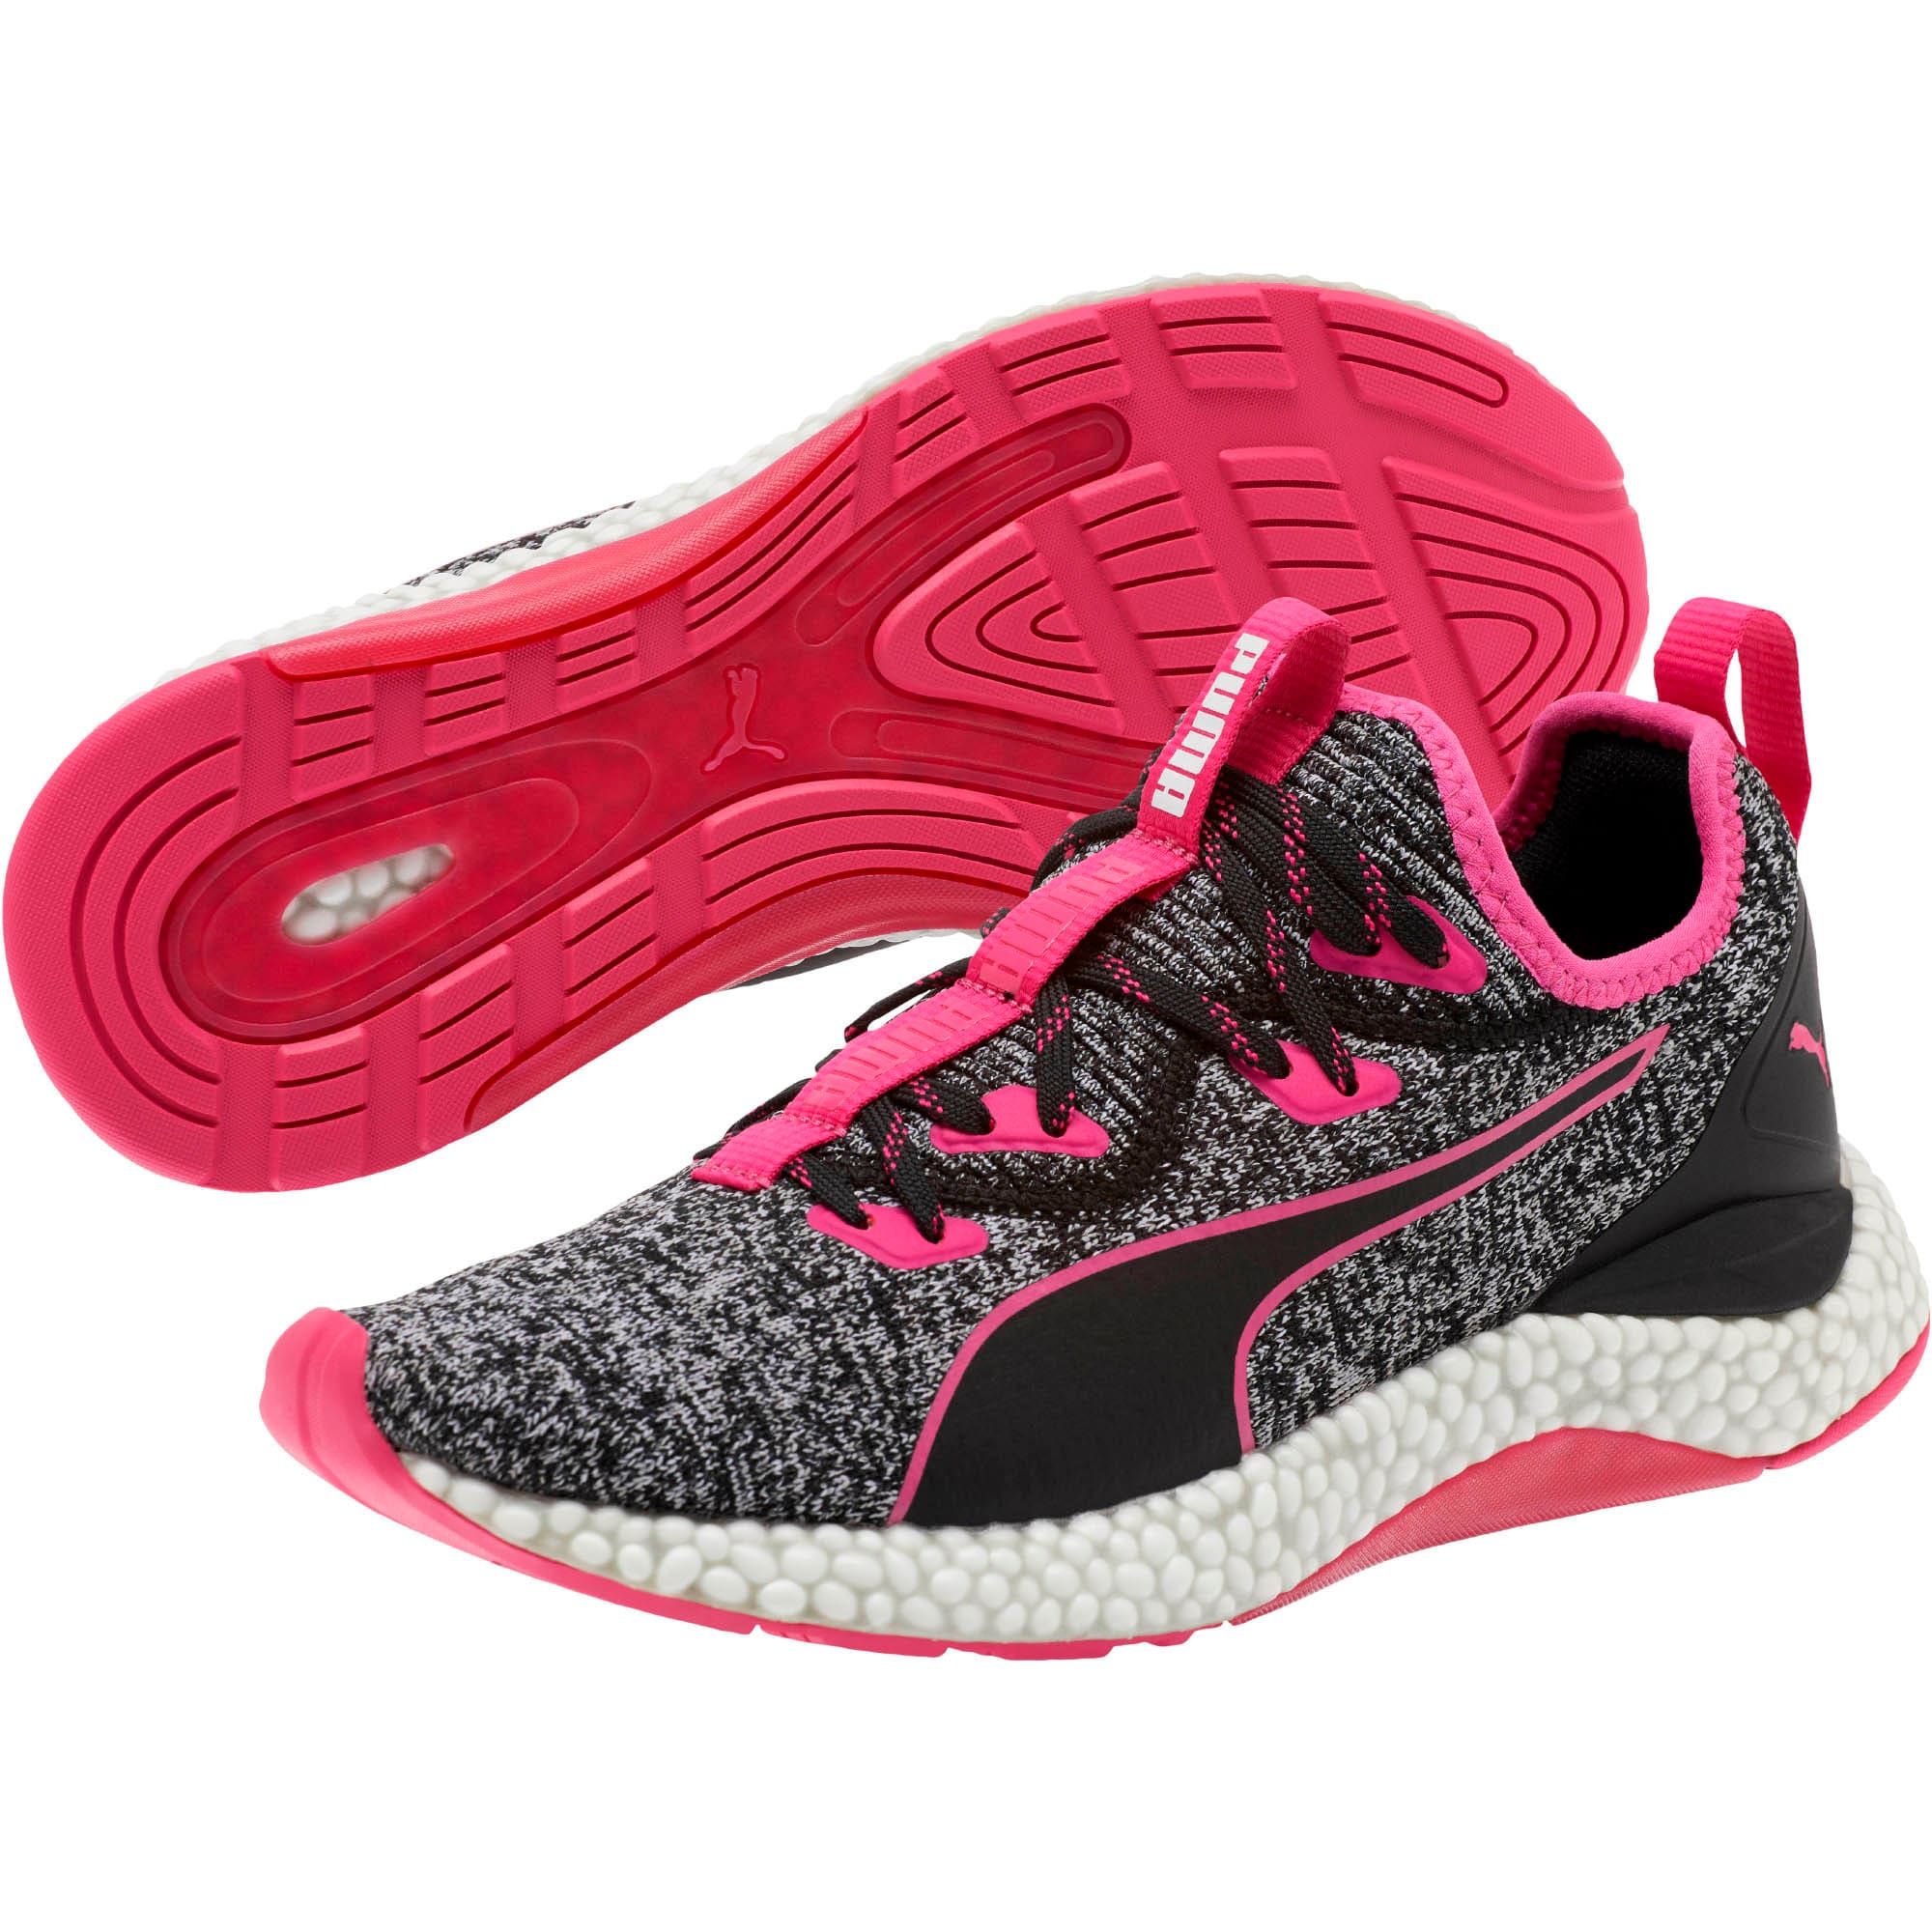 Thumbnail 2 of HYBRID Runner Women's Running Shoes, Puma Black-Fuchsia Purple, medium